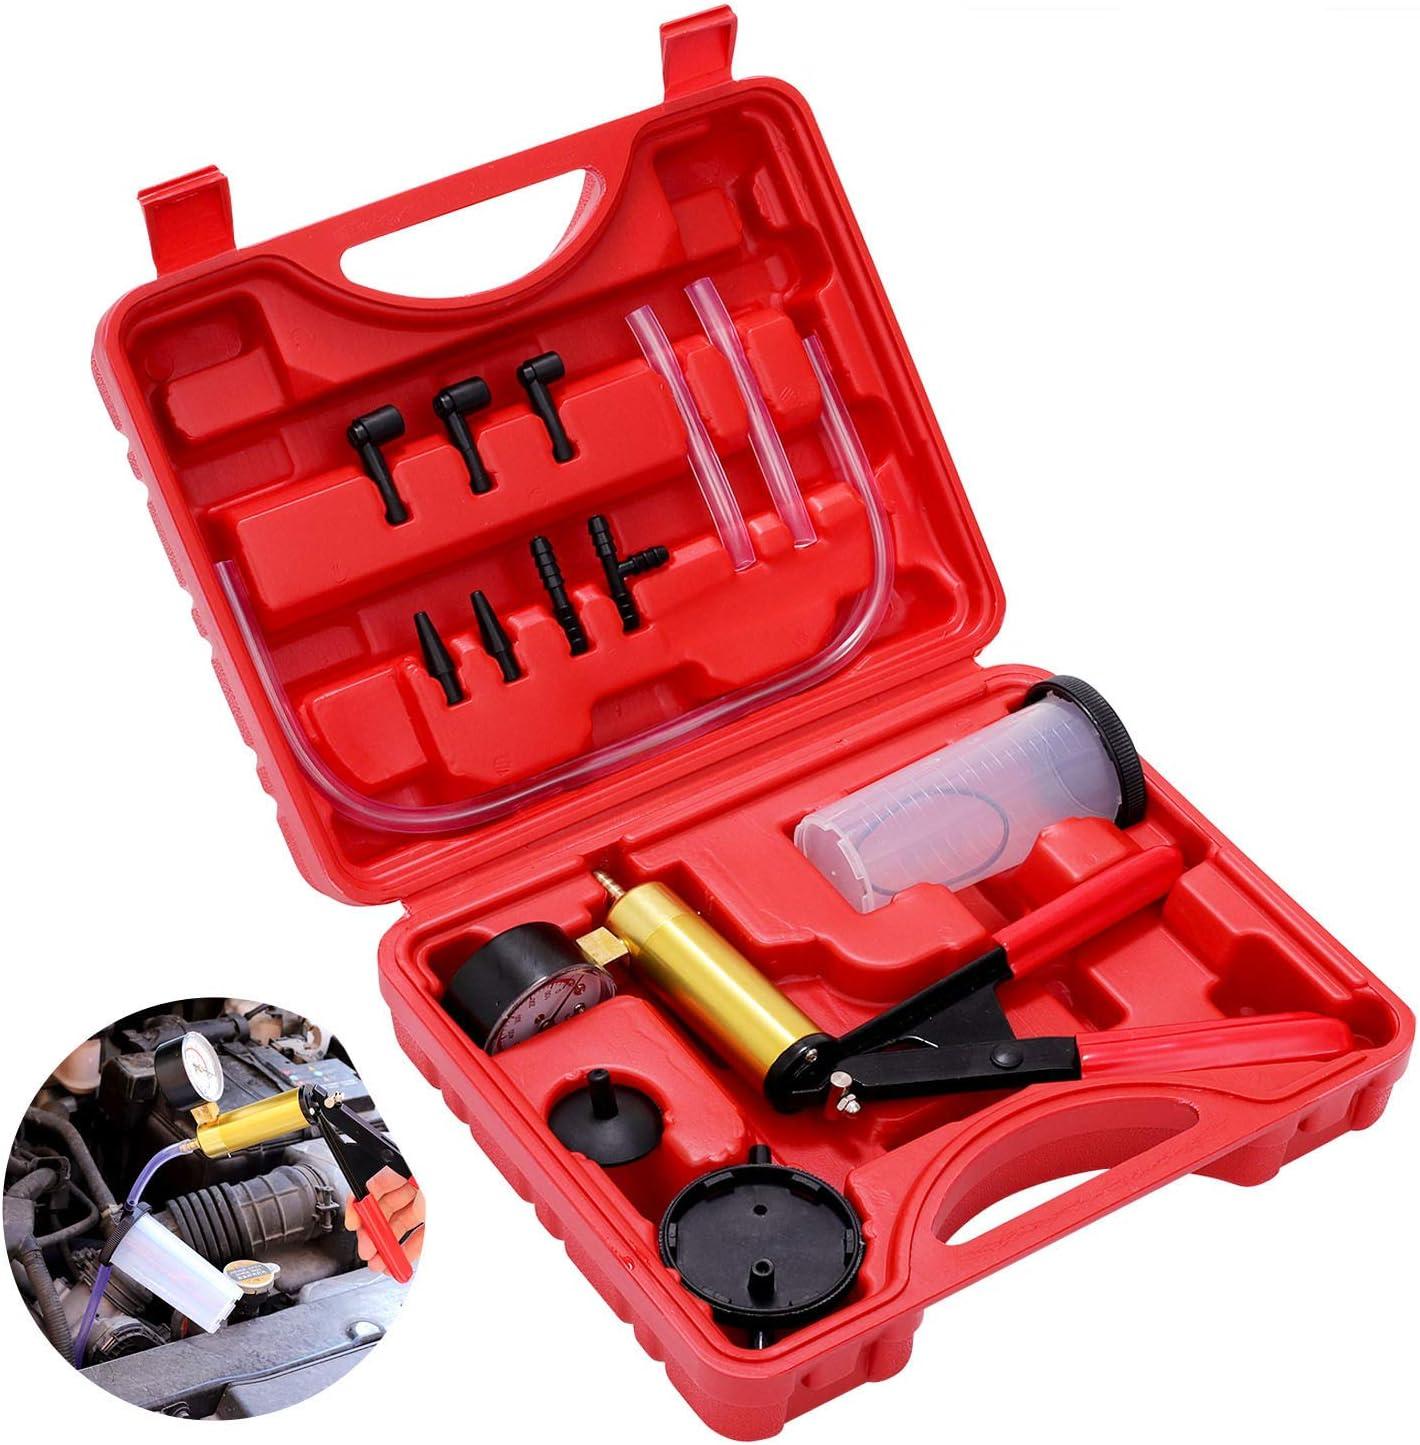 Yonligonju 16PCS Handheld Vacuum Pump Brake Bleeder Kit for Motorcycle Brake System Bleeding Tools with Gauge Adapters Automotive Brake Fluid Bleeding Set for Bike Car Truck